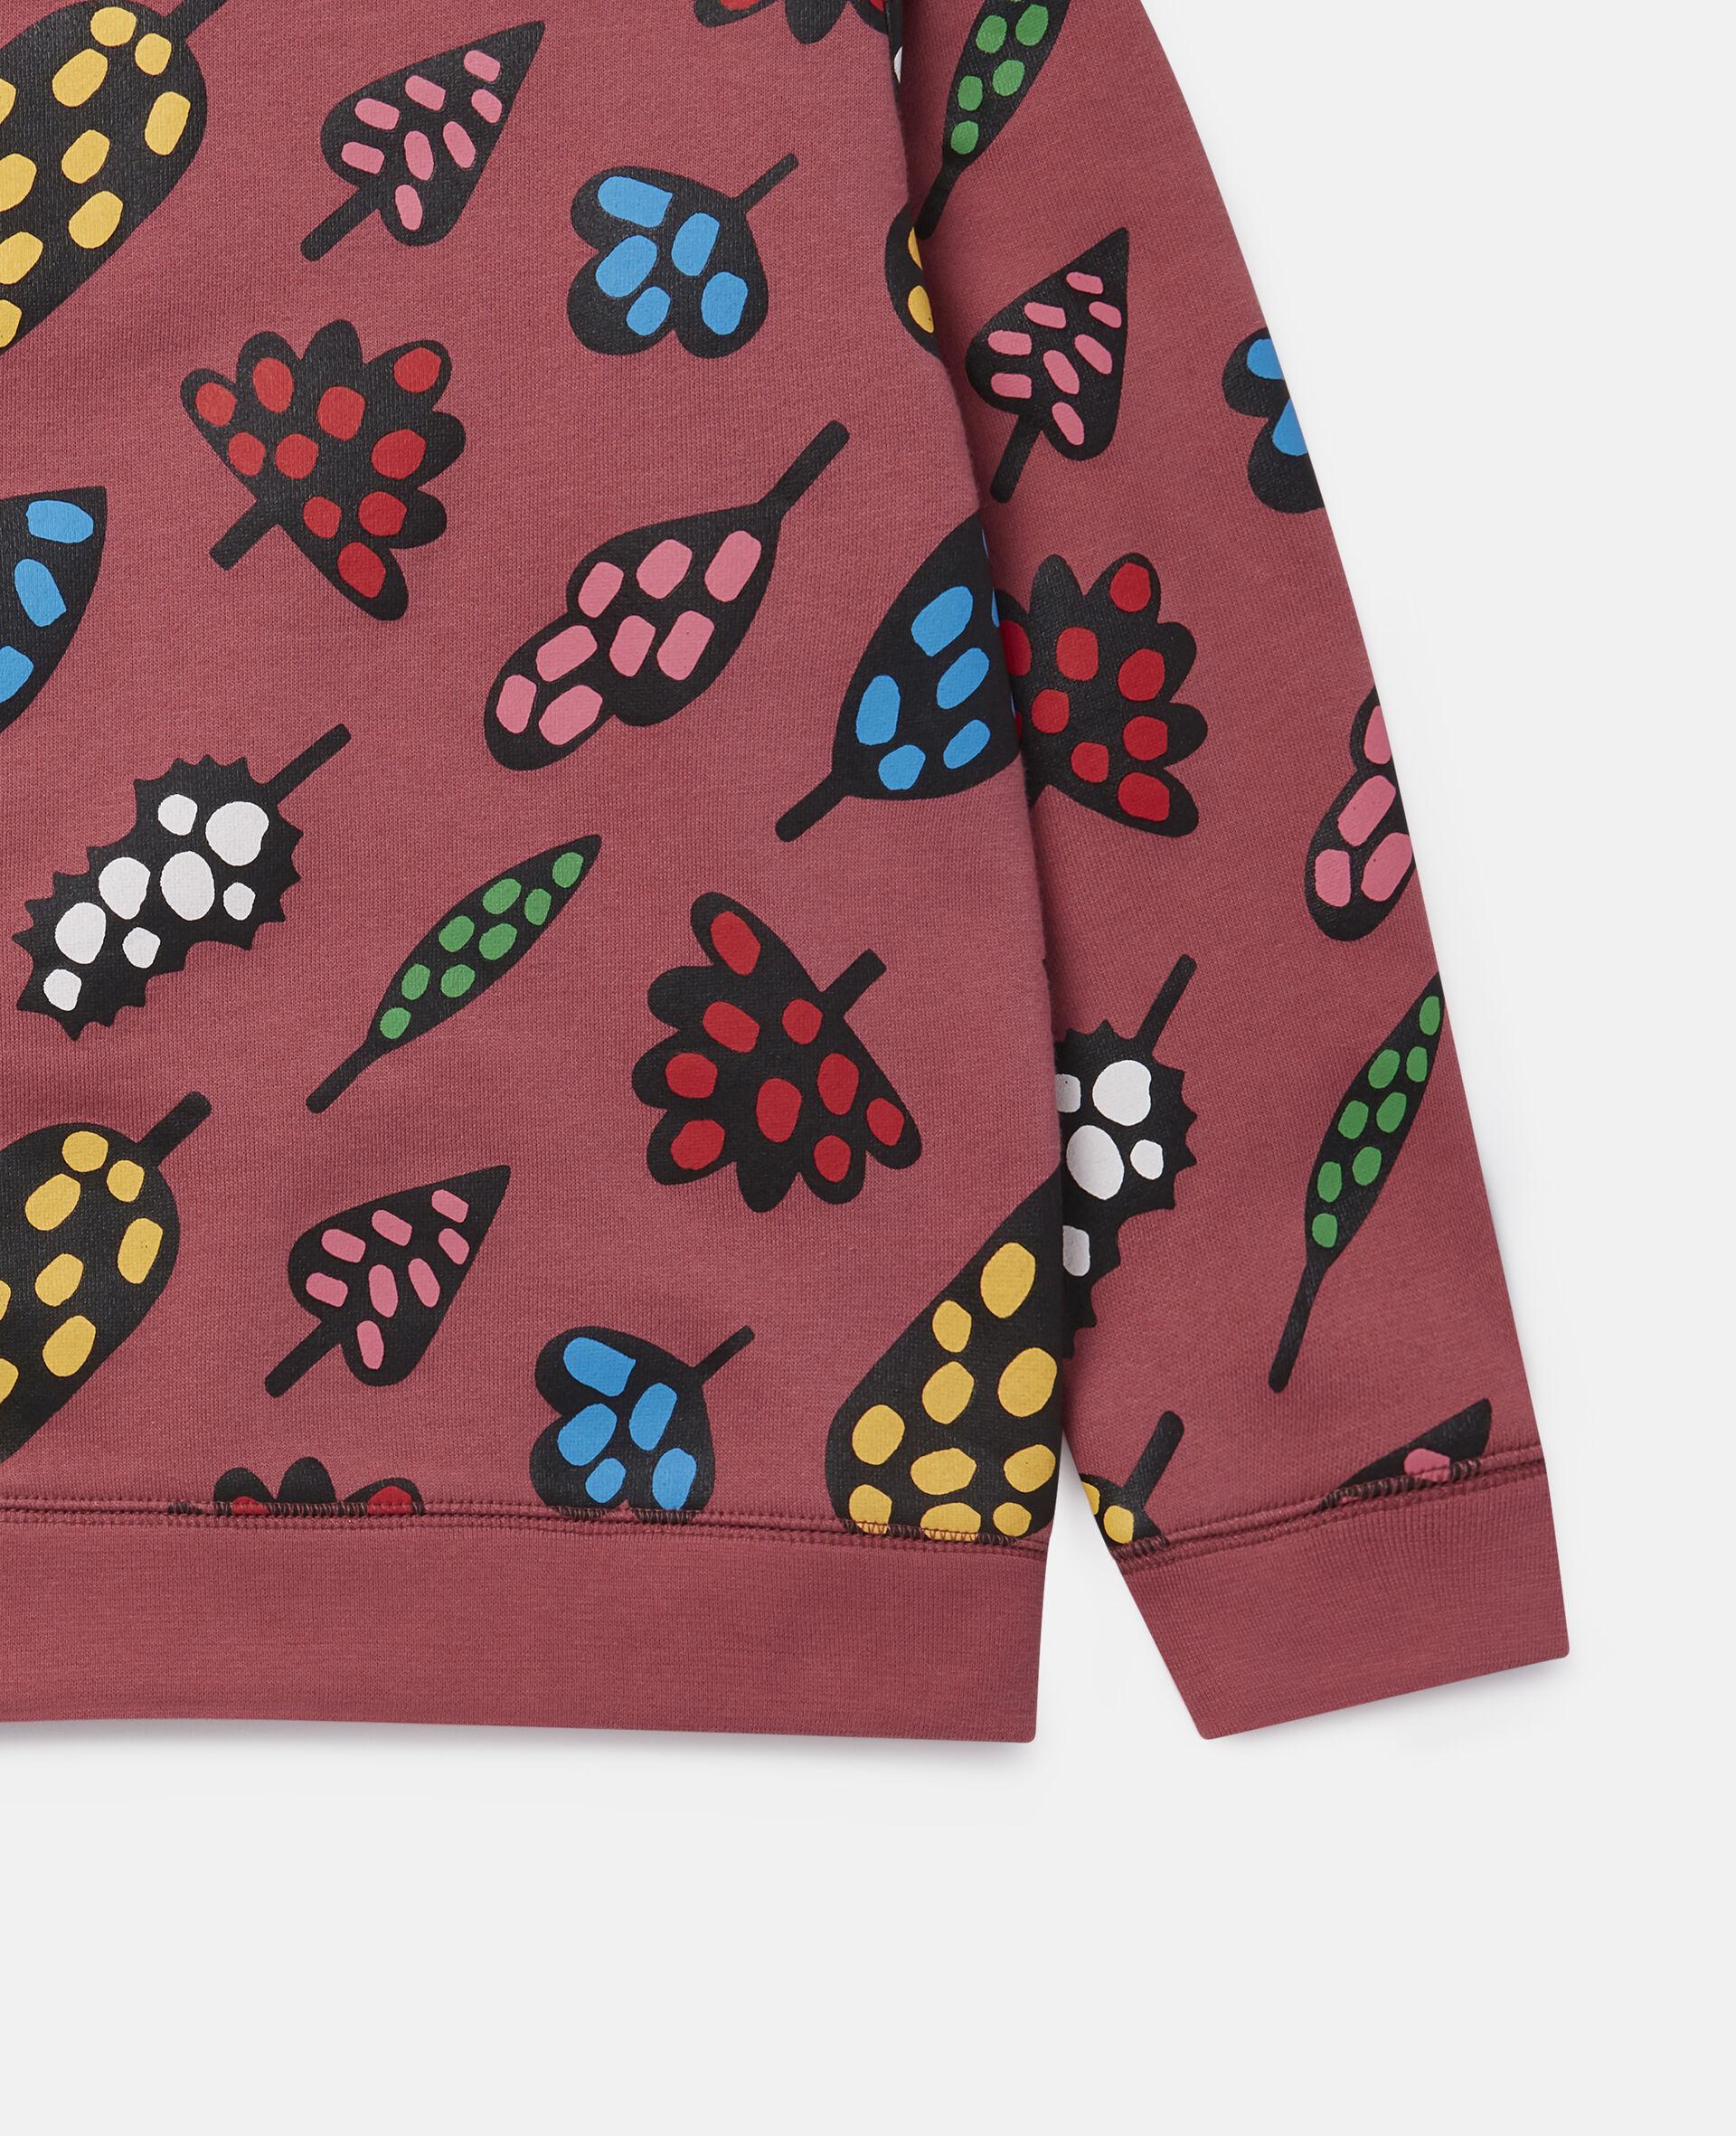 Spotty Leaves Cotton Fleece Sweatshirt -Multicolour-large image number 1